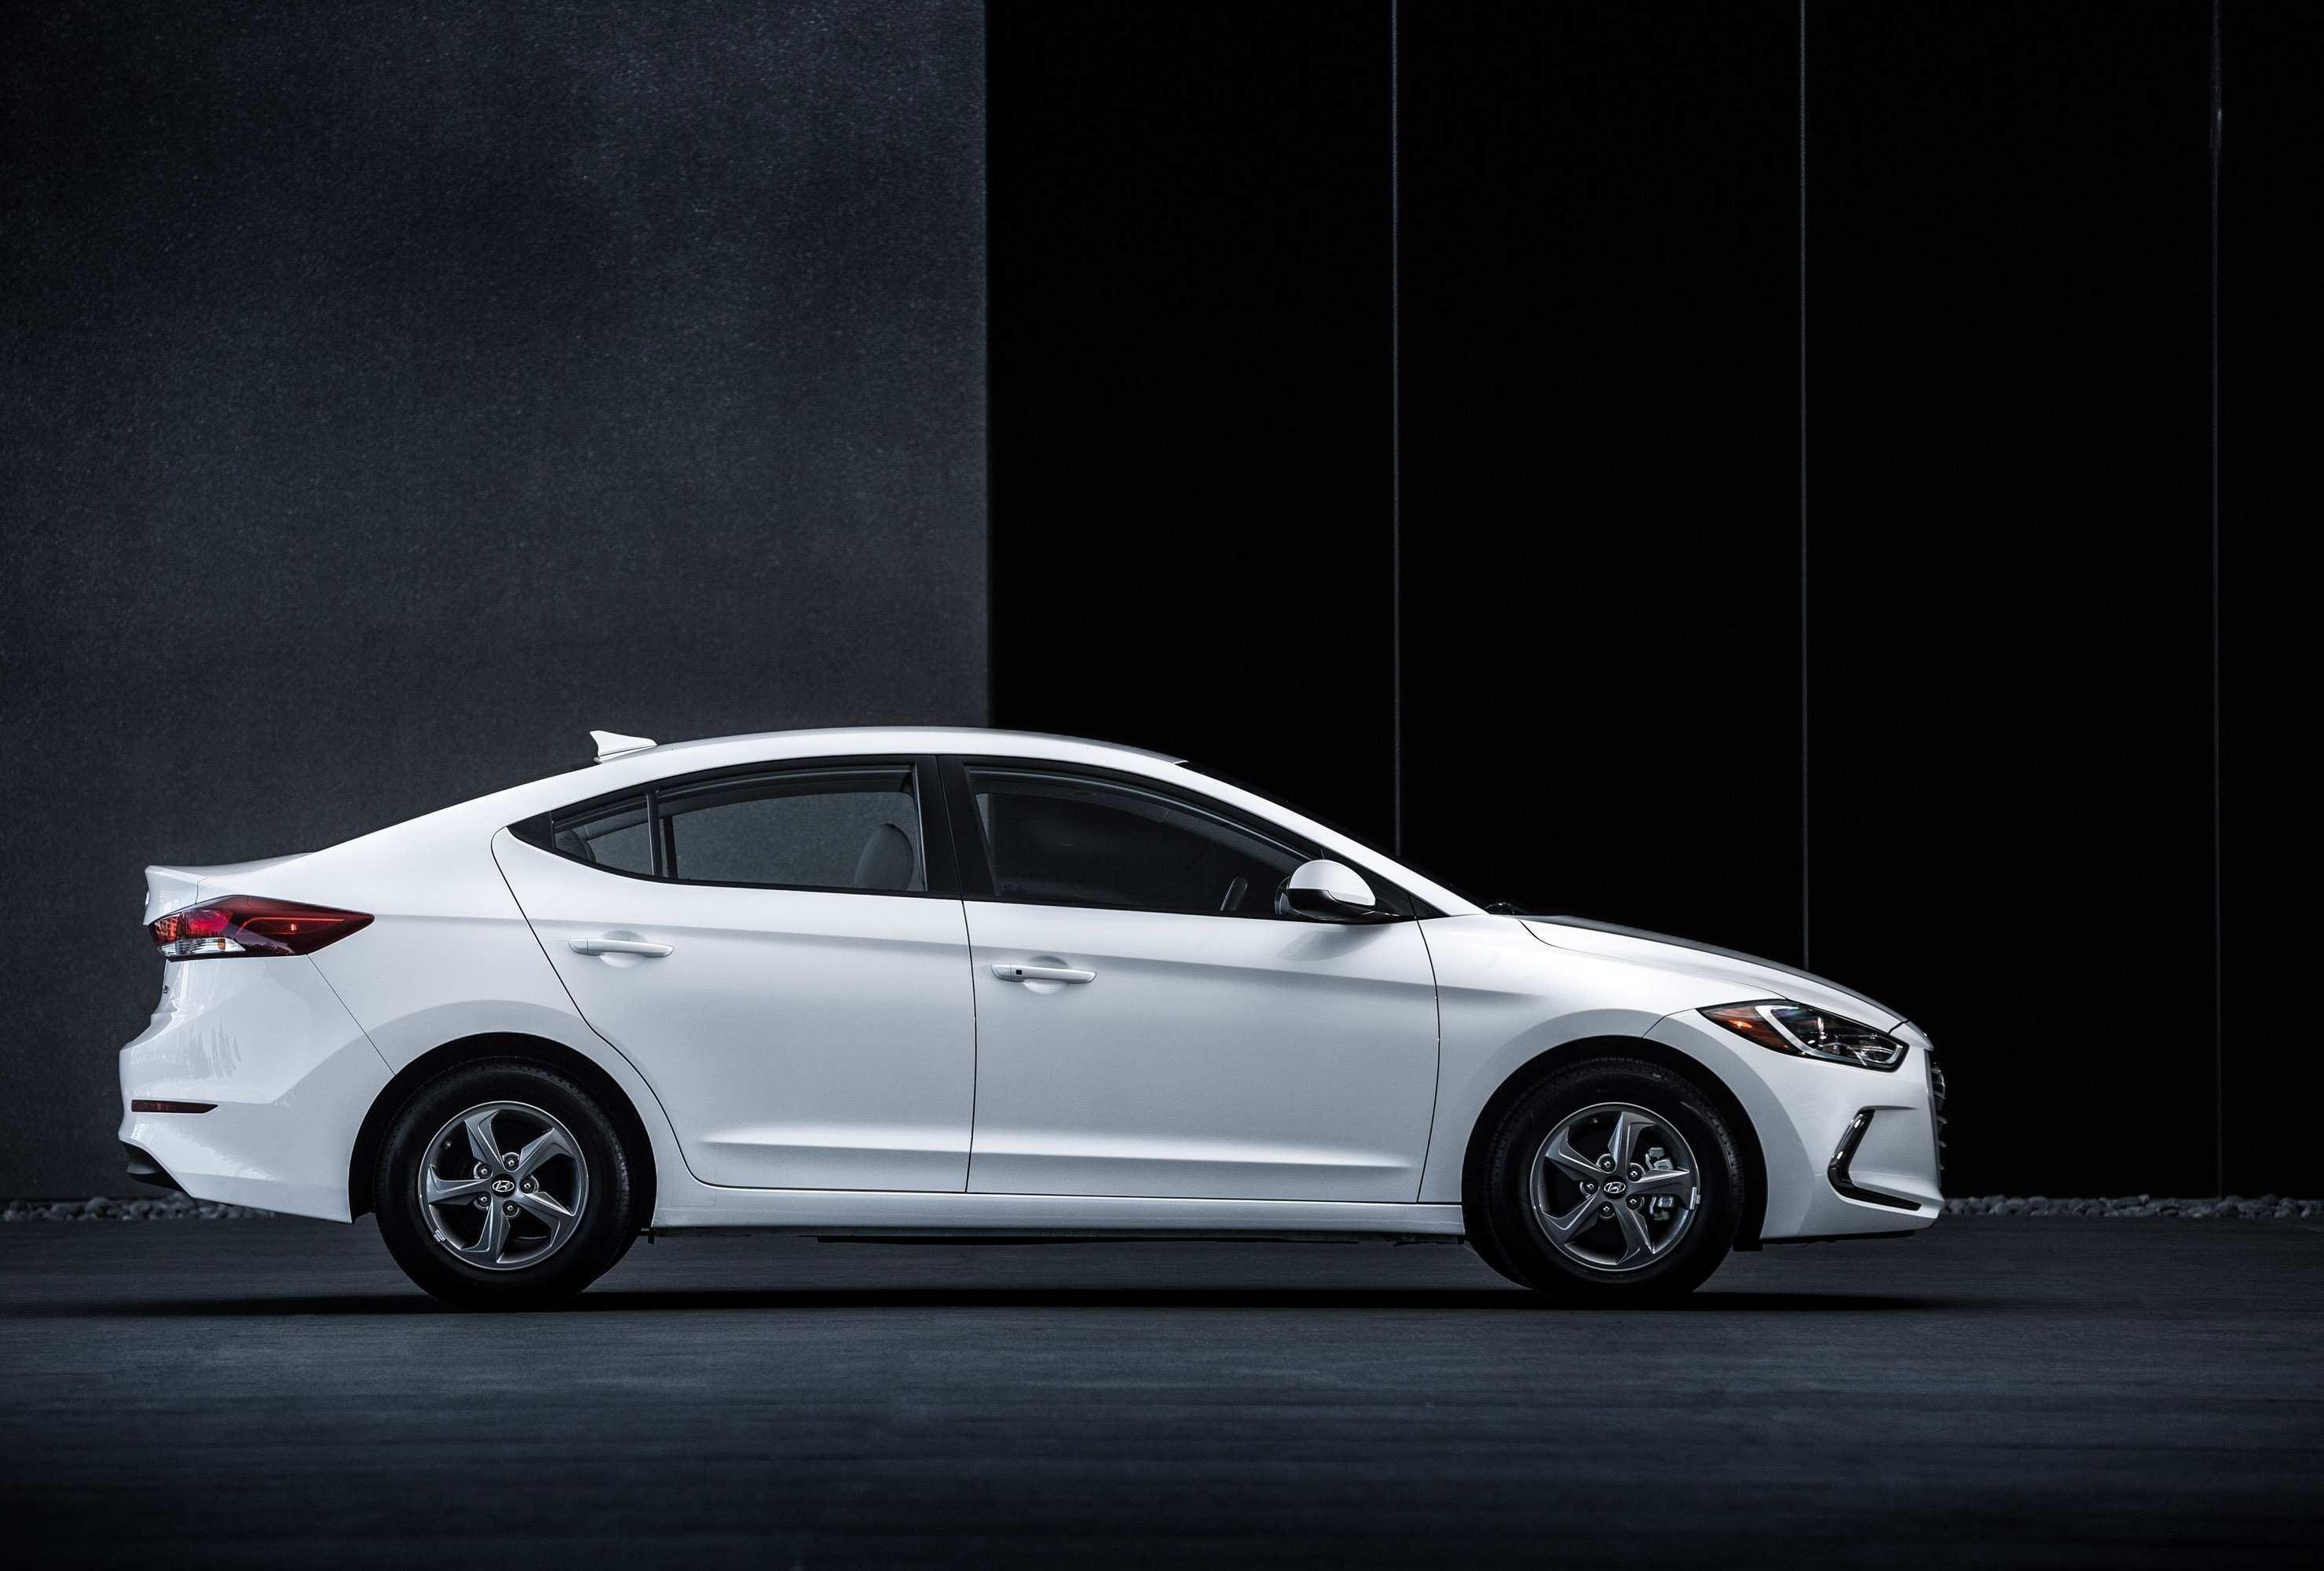 24 New 2020 Hyundai Elantra Sedan Redesign and Concept for 2020 Hyundai Elantra Sedan